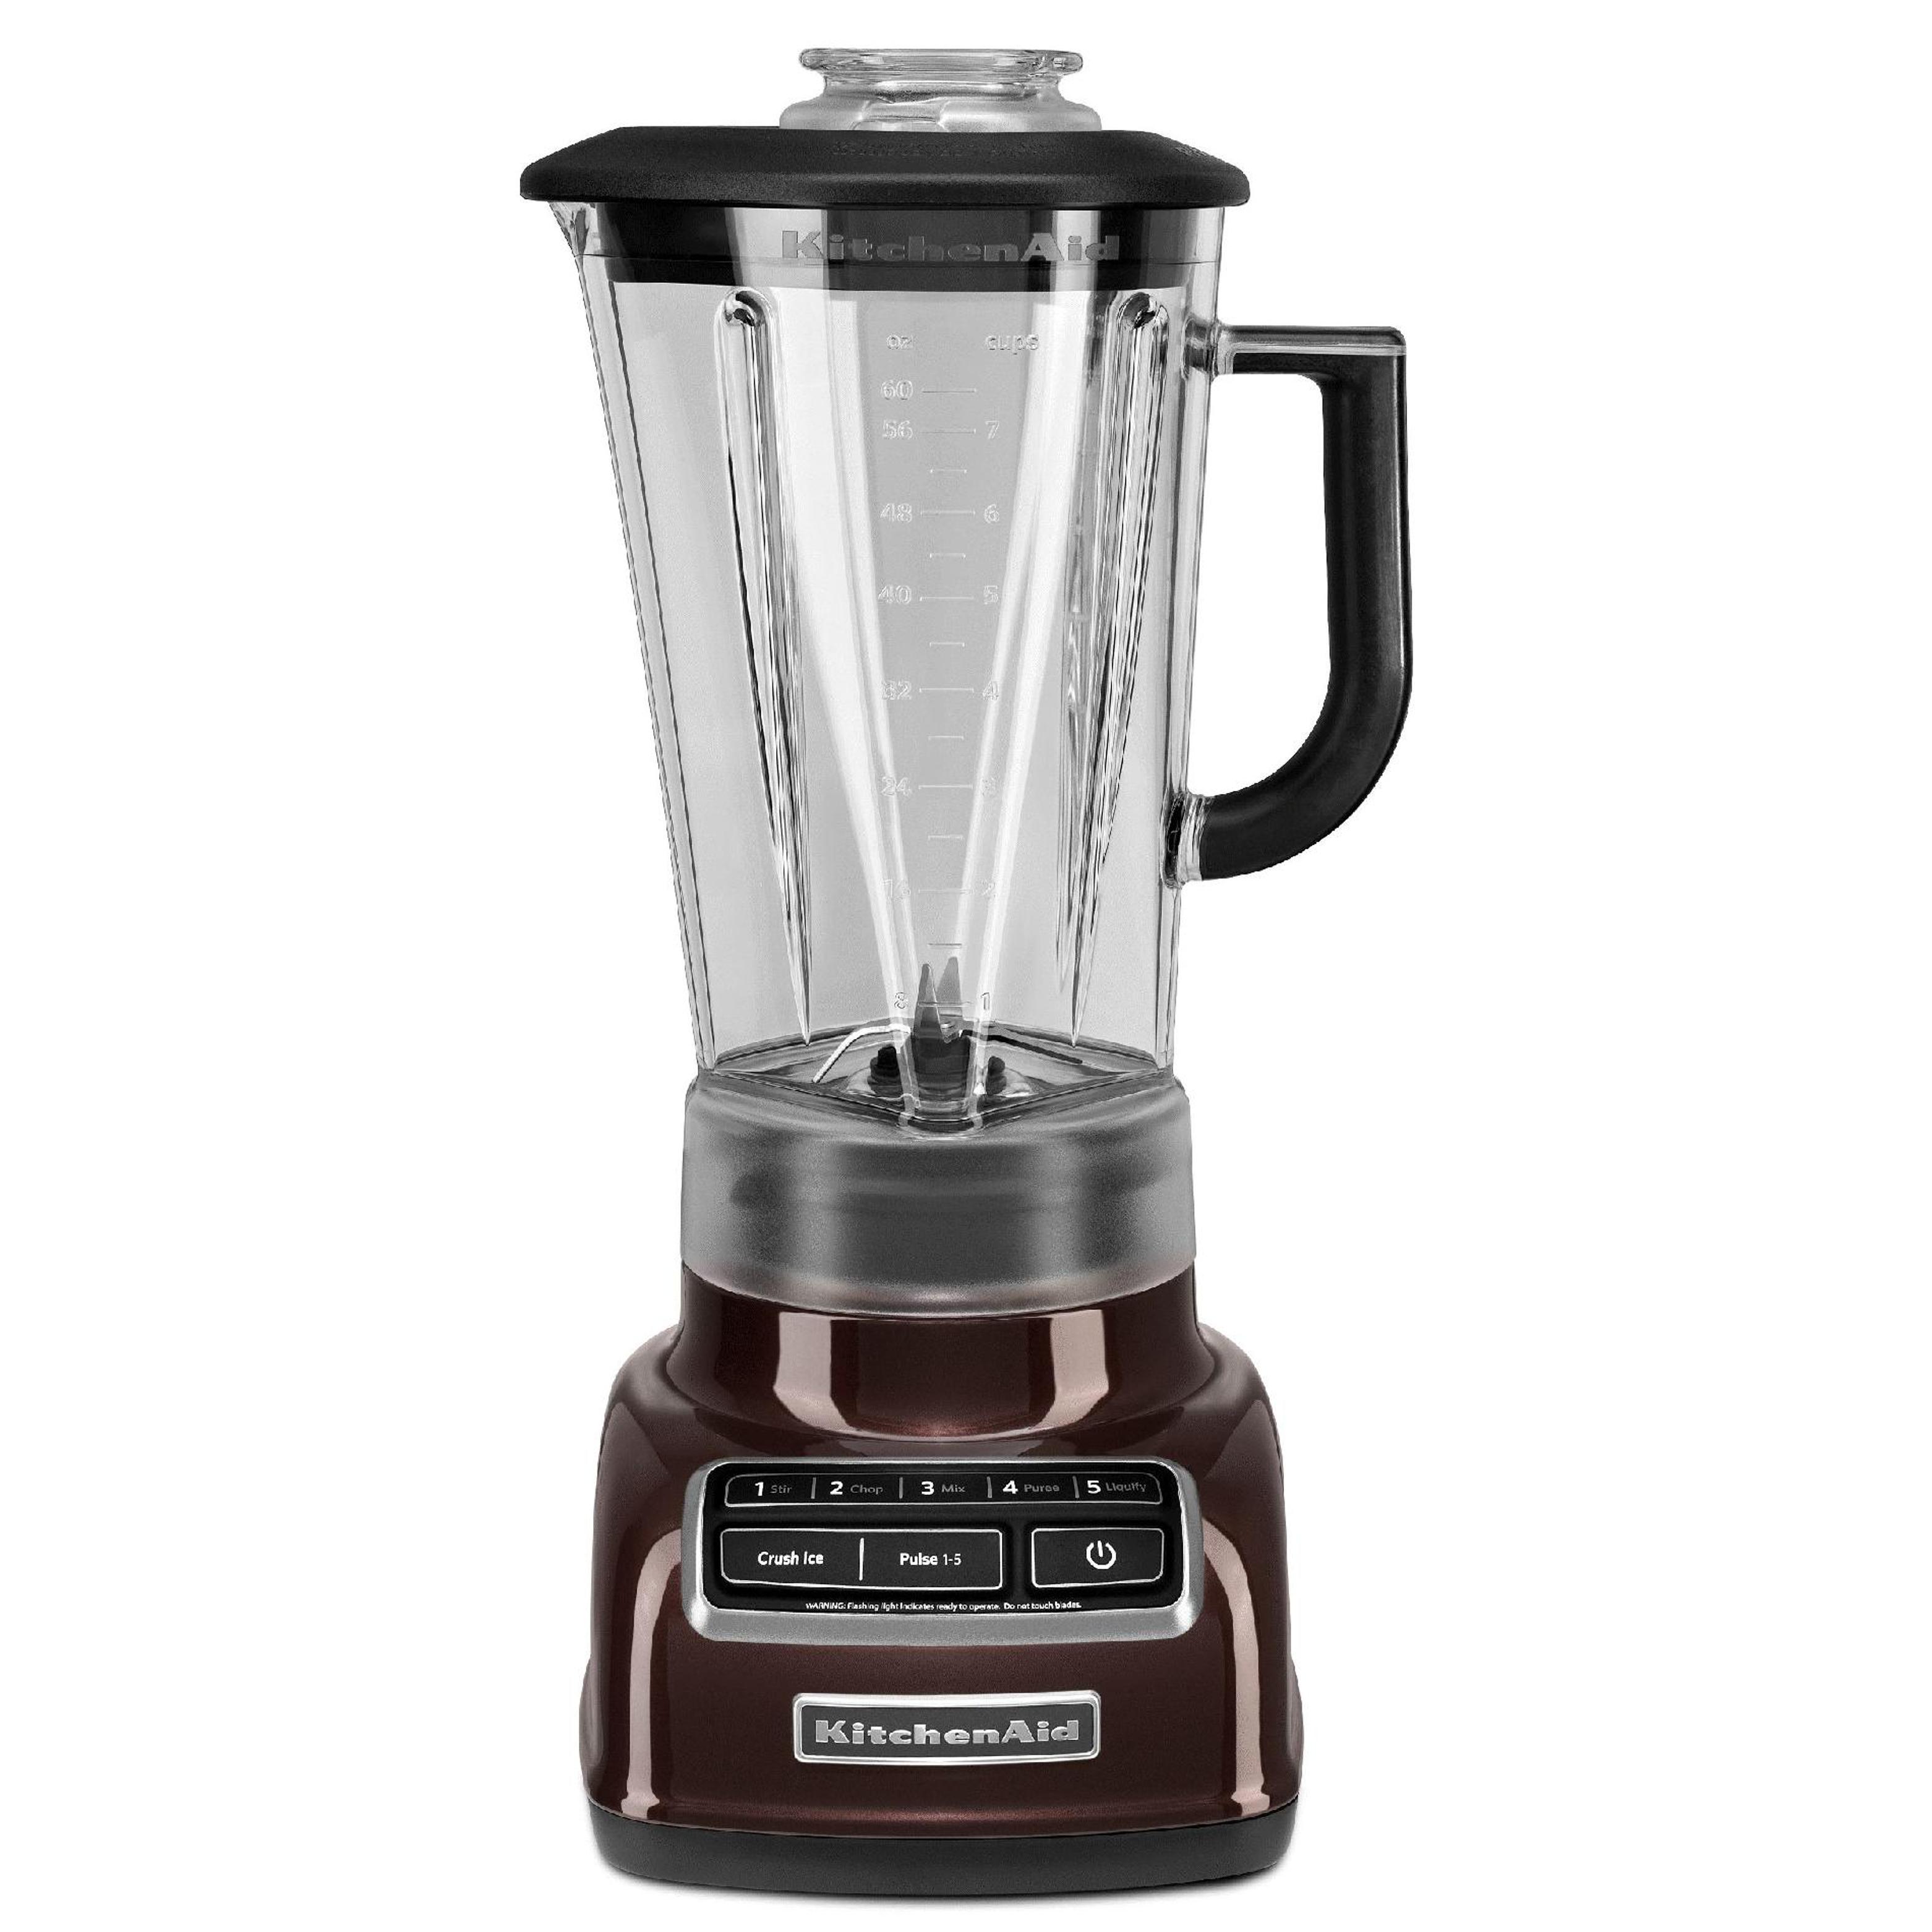 Kitchenaid 5 Speed Diamond Blender In Espresso Sears